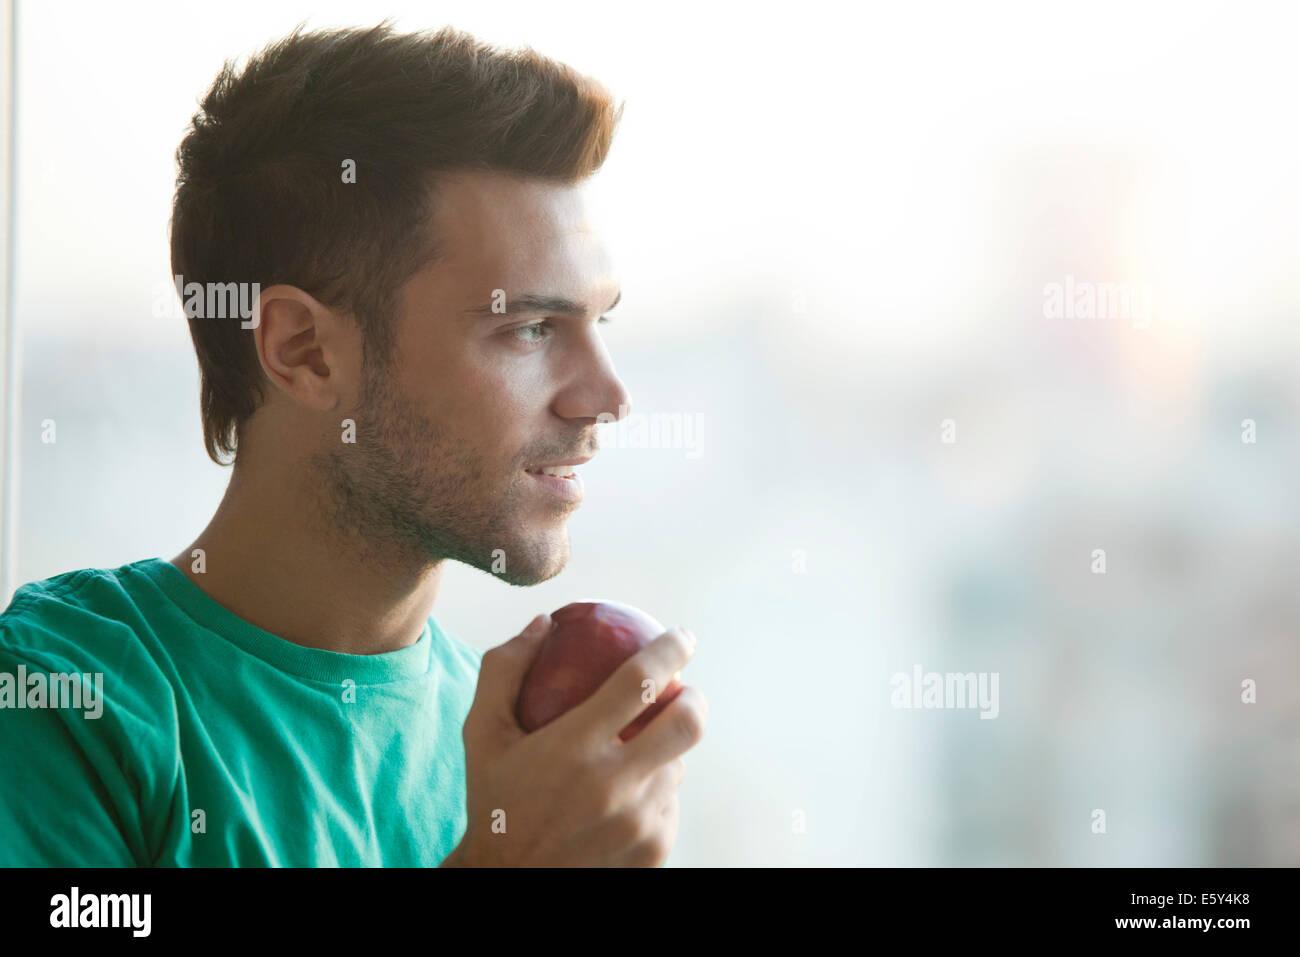 Man holding apple, gazing out window - Stock Image